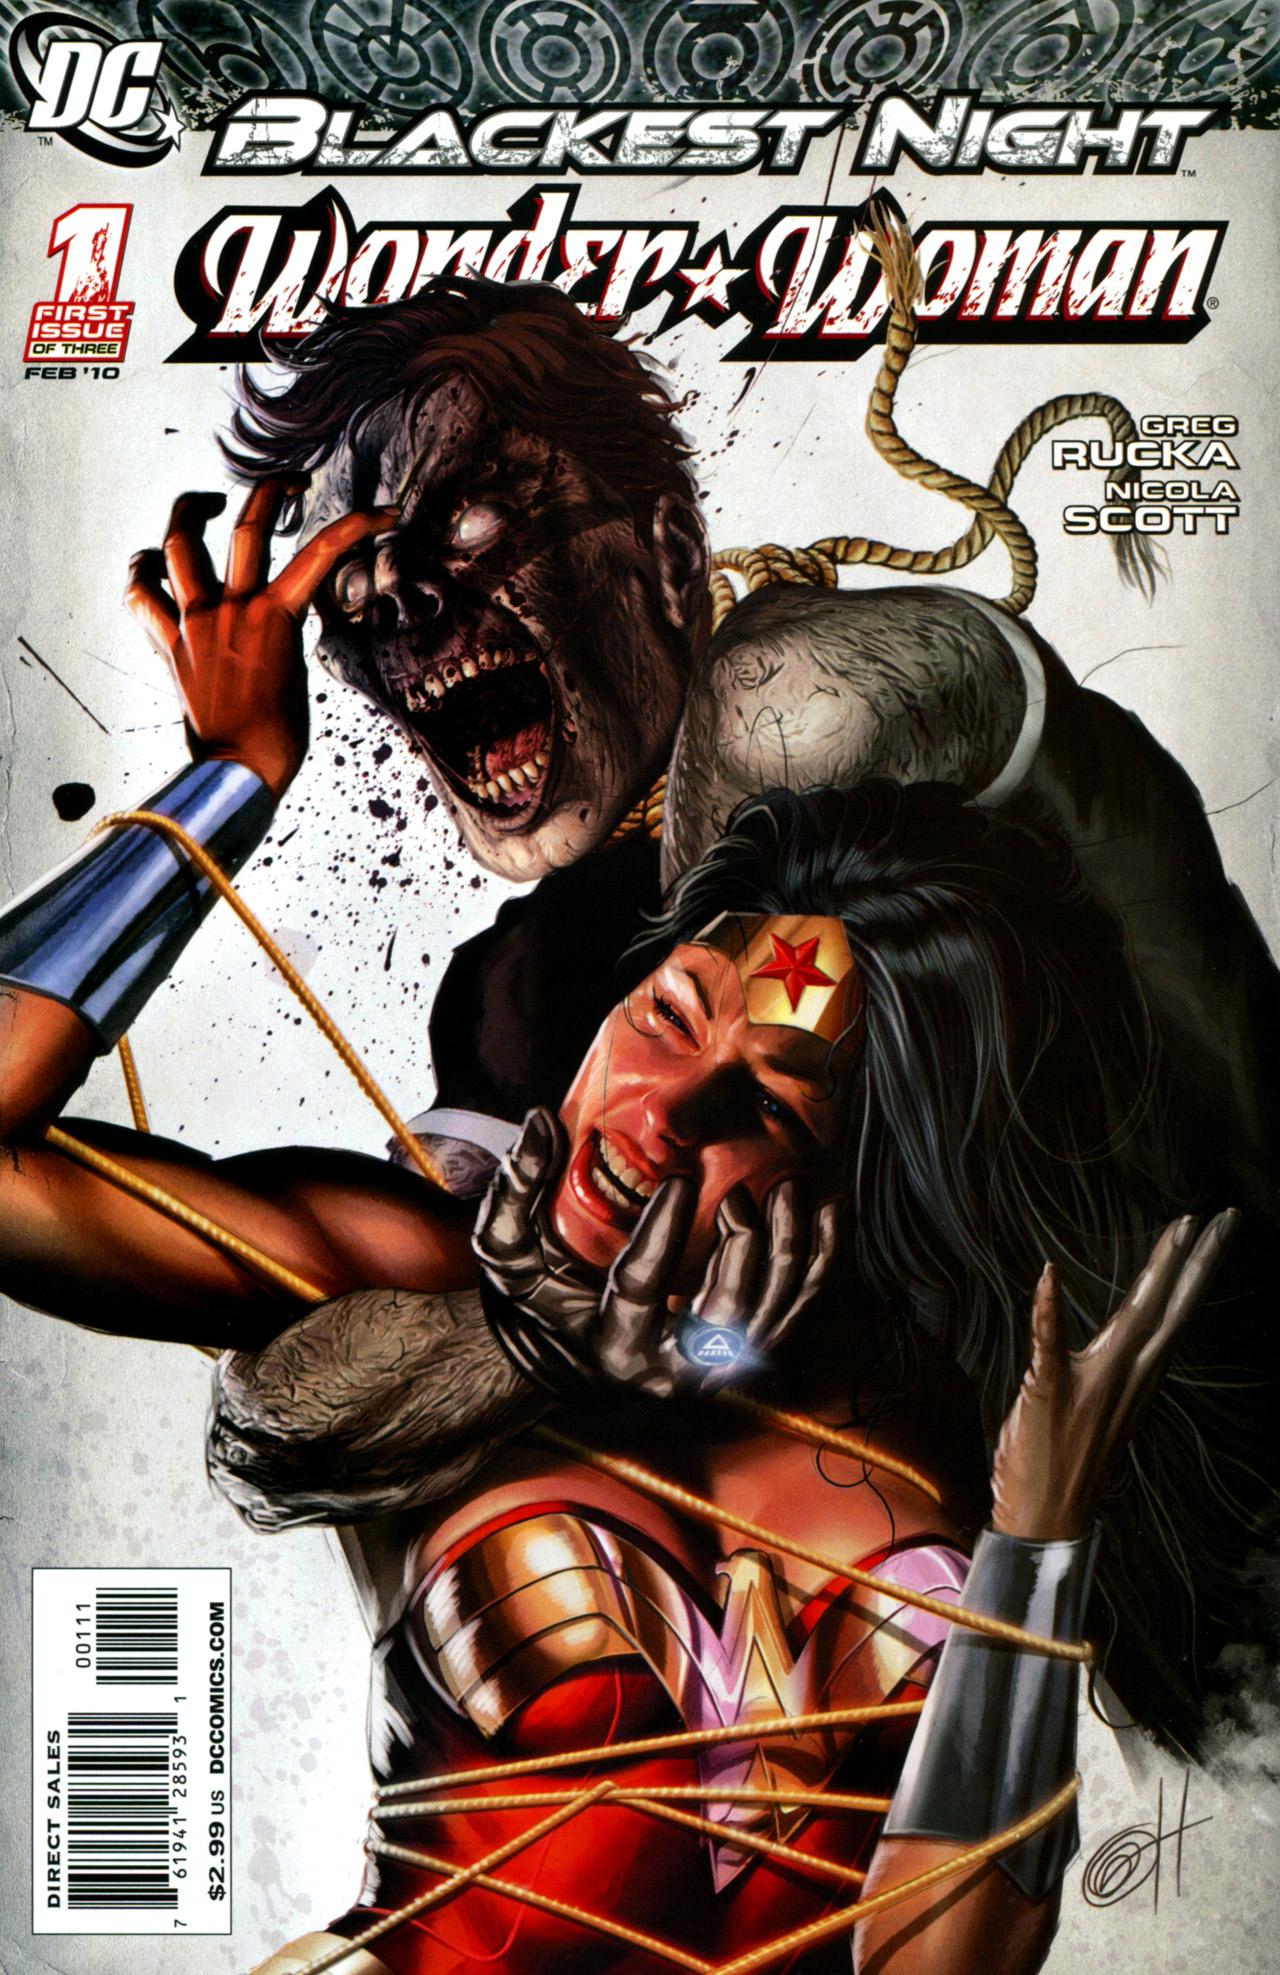 Blackest Night: Wonder Woman 1 Page 1